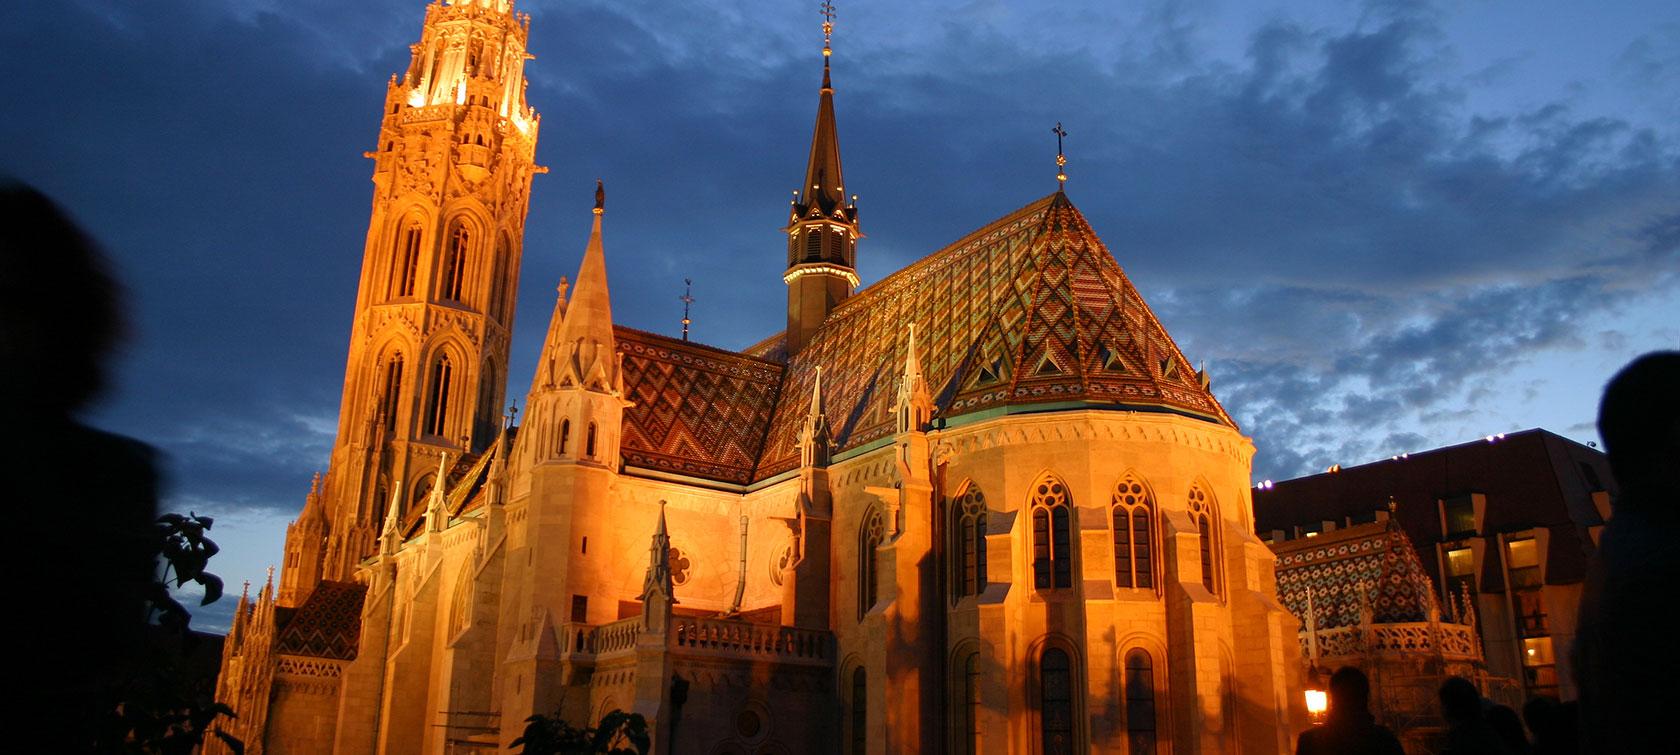 A Tale Of Three Cities Europe Hungary Czech Republic Austria